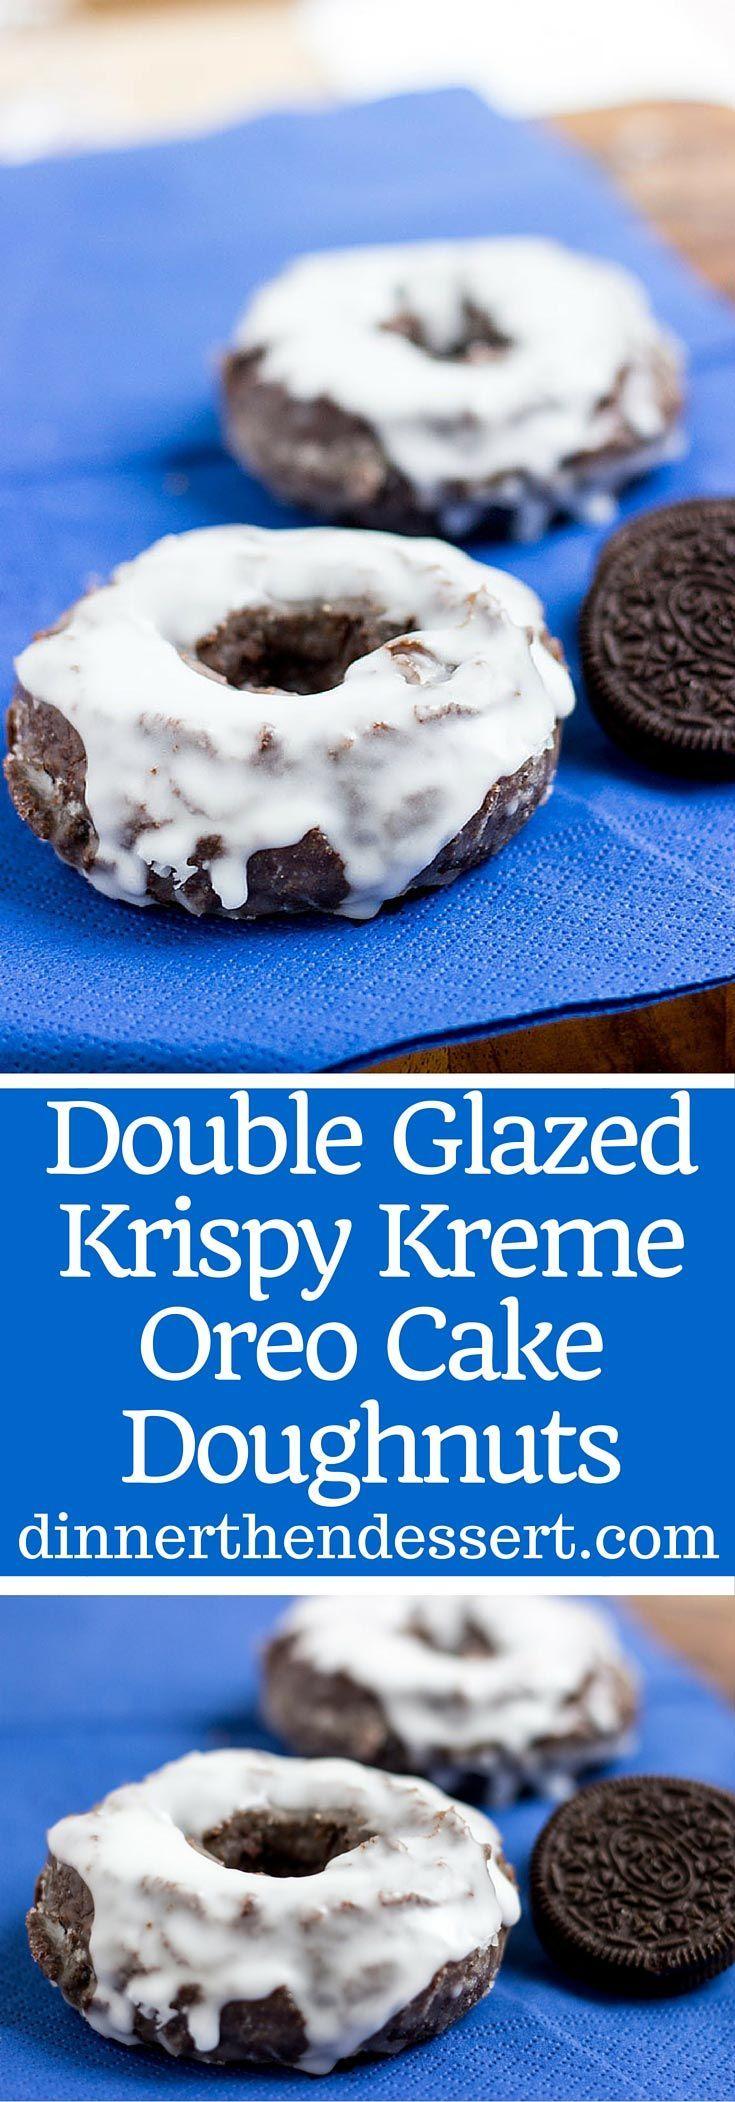 These Krispy Kreme Oreo Cake Doughnuts are a fun play on the Krispy Kreme chocolate glazed cake doughnut and Oreo doughnut that is double glazed!